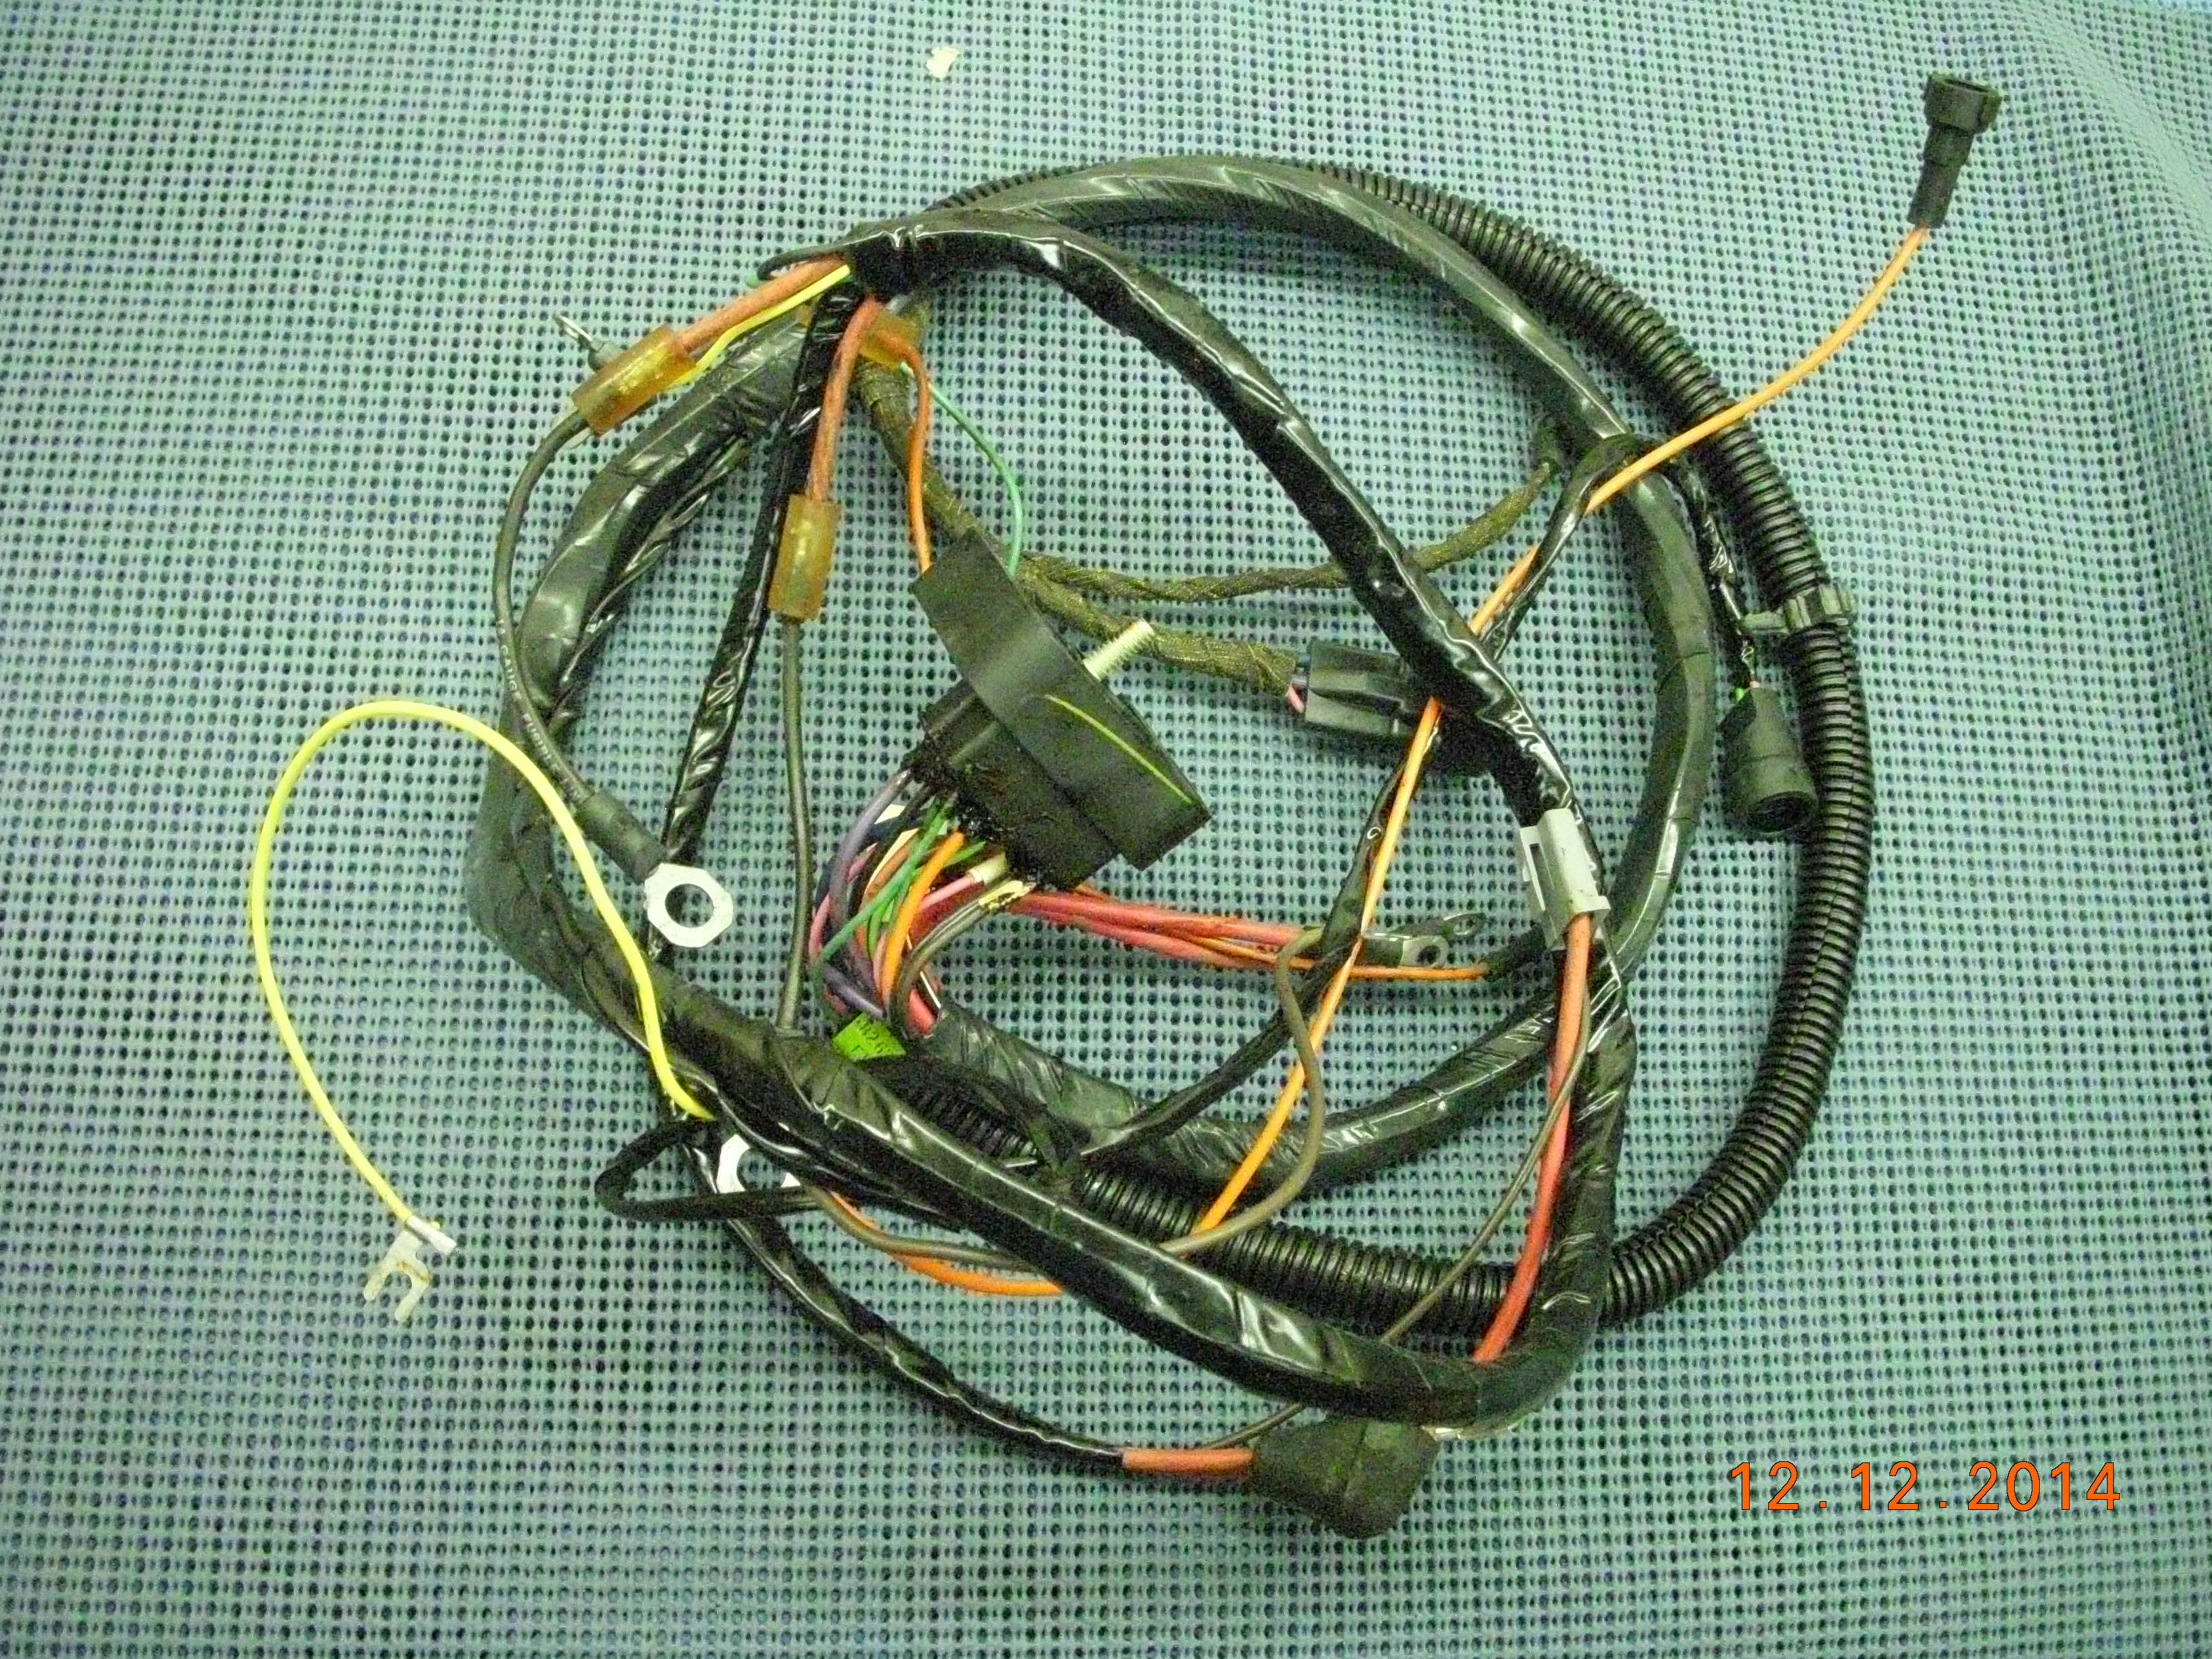 1973 1974 gm ignition start wiring harness assembly nos 8901992 rh oldsobsolete com 2010 Chevy Malibu Radio Wiring Harness GM Wiring Harness